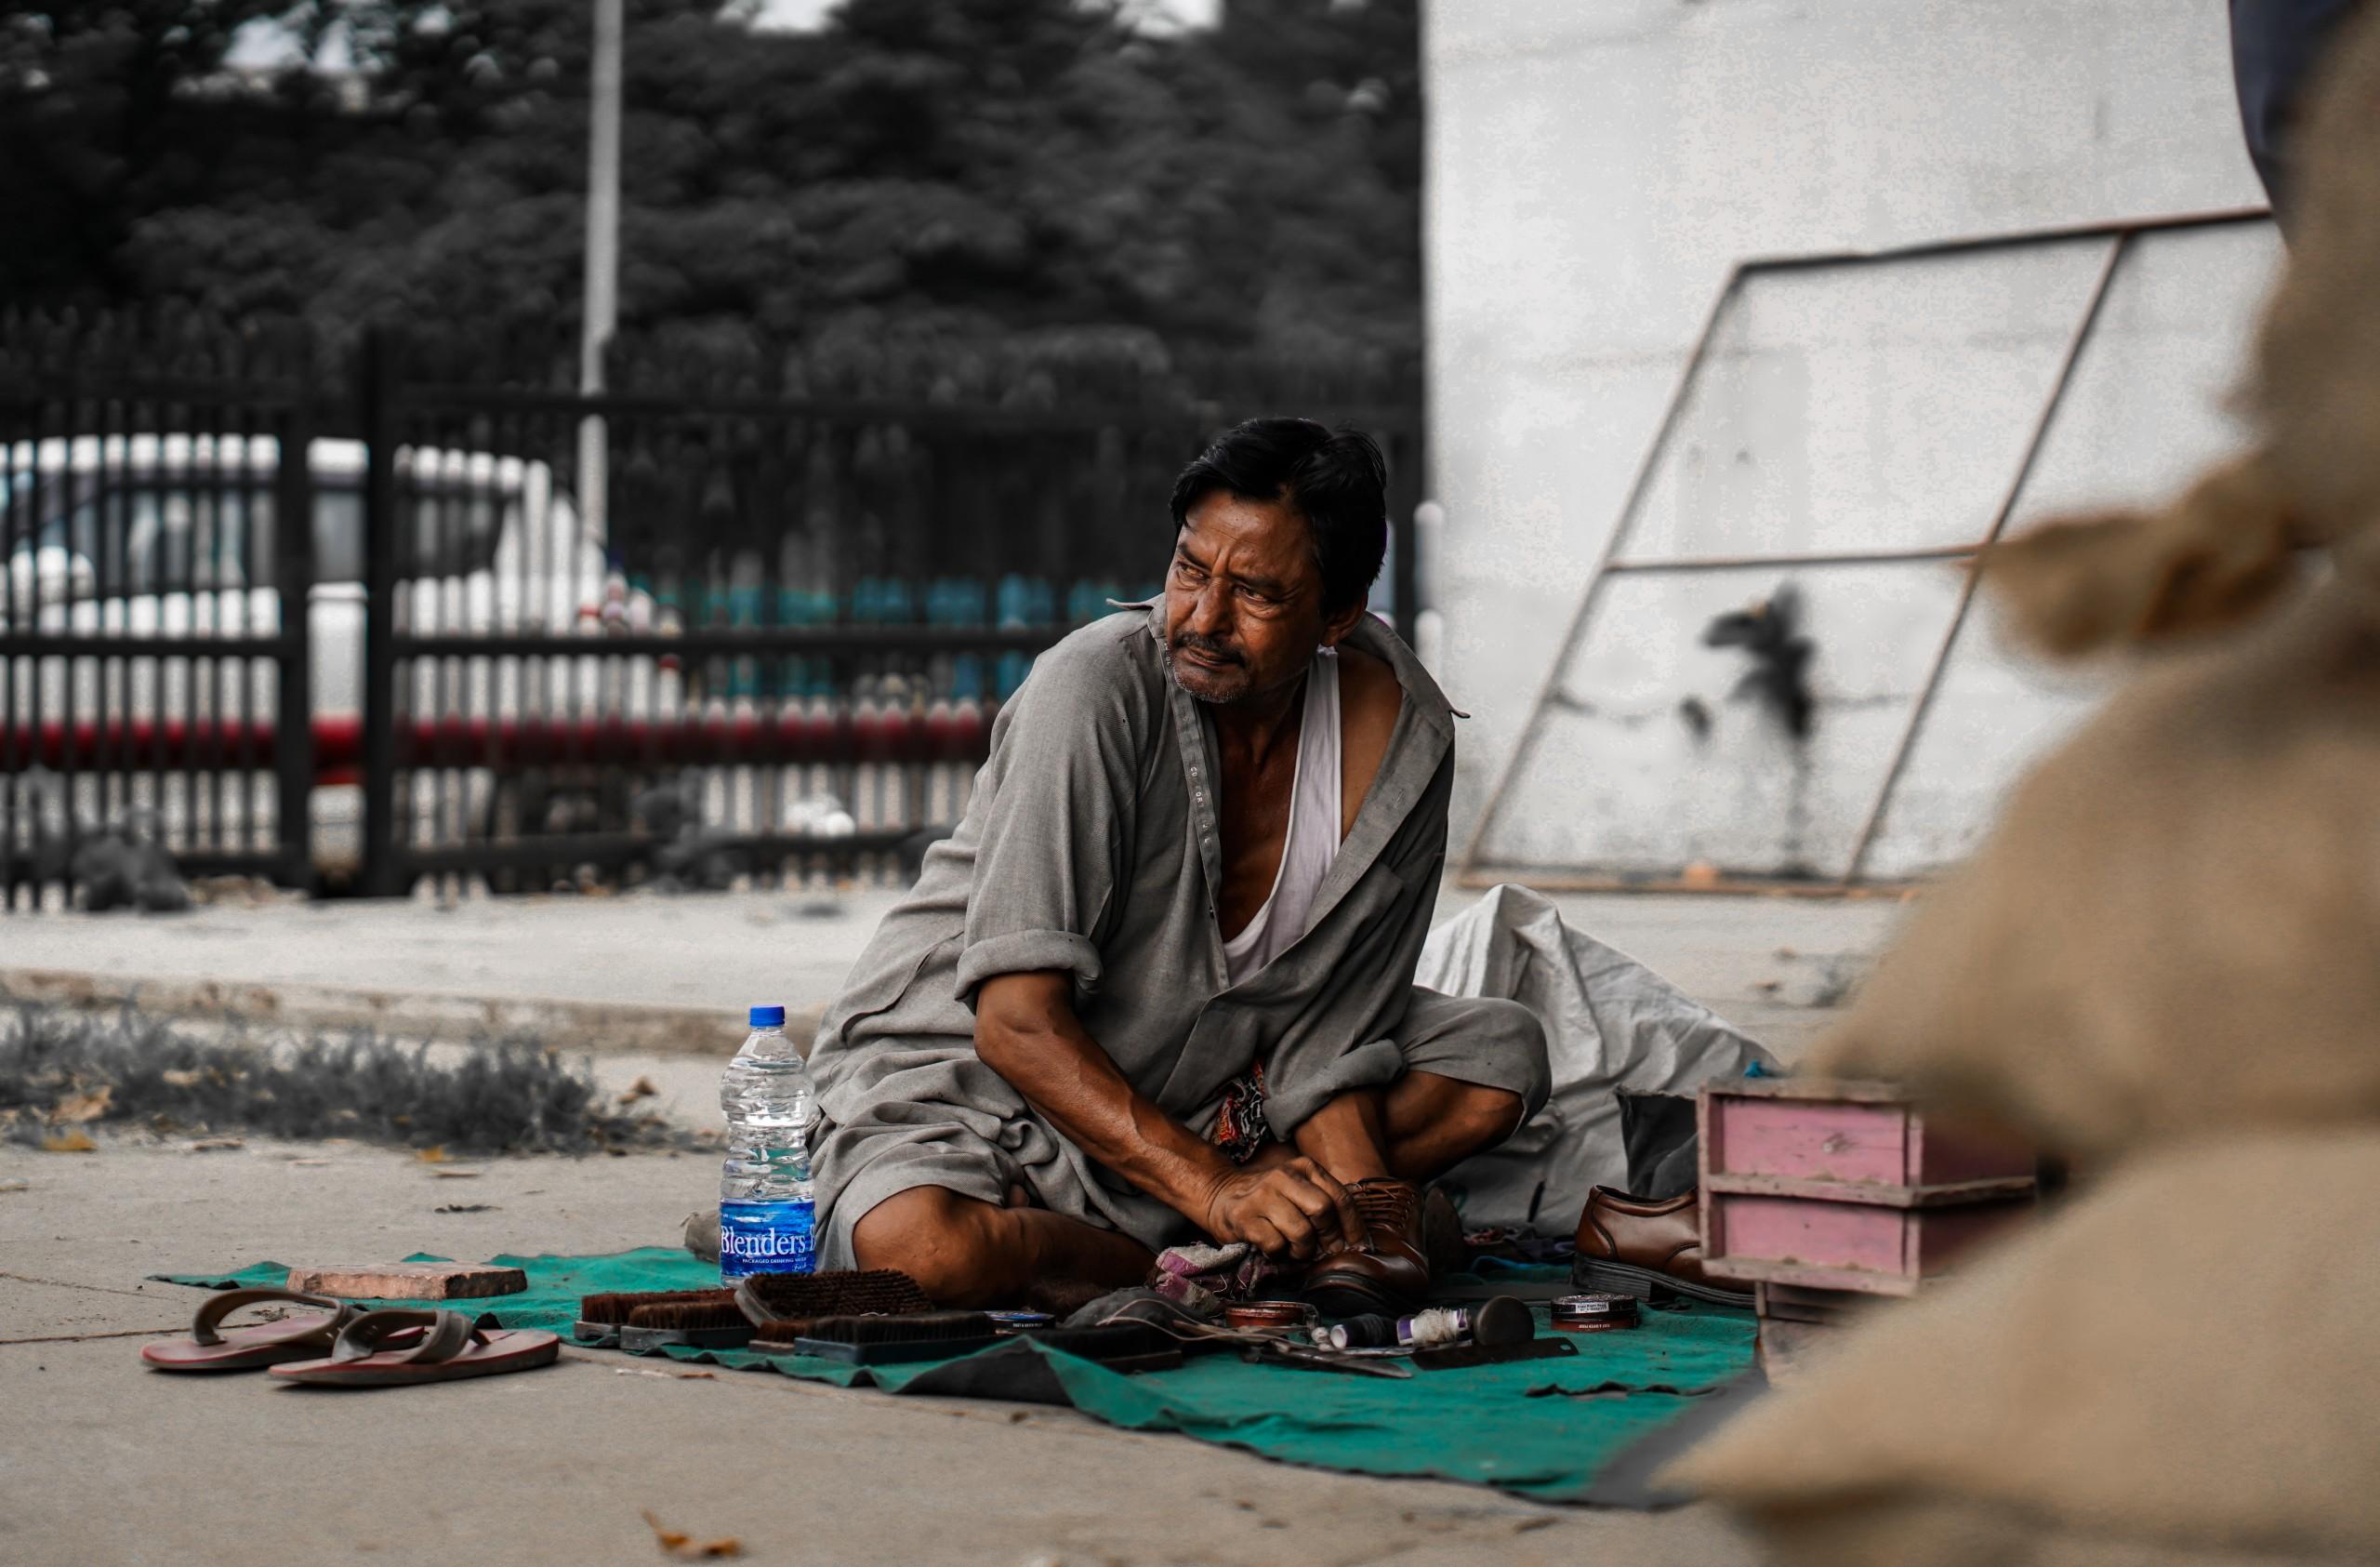 A Shoeshiner